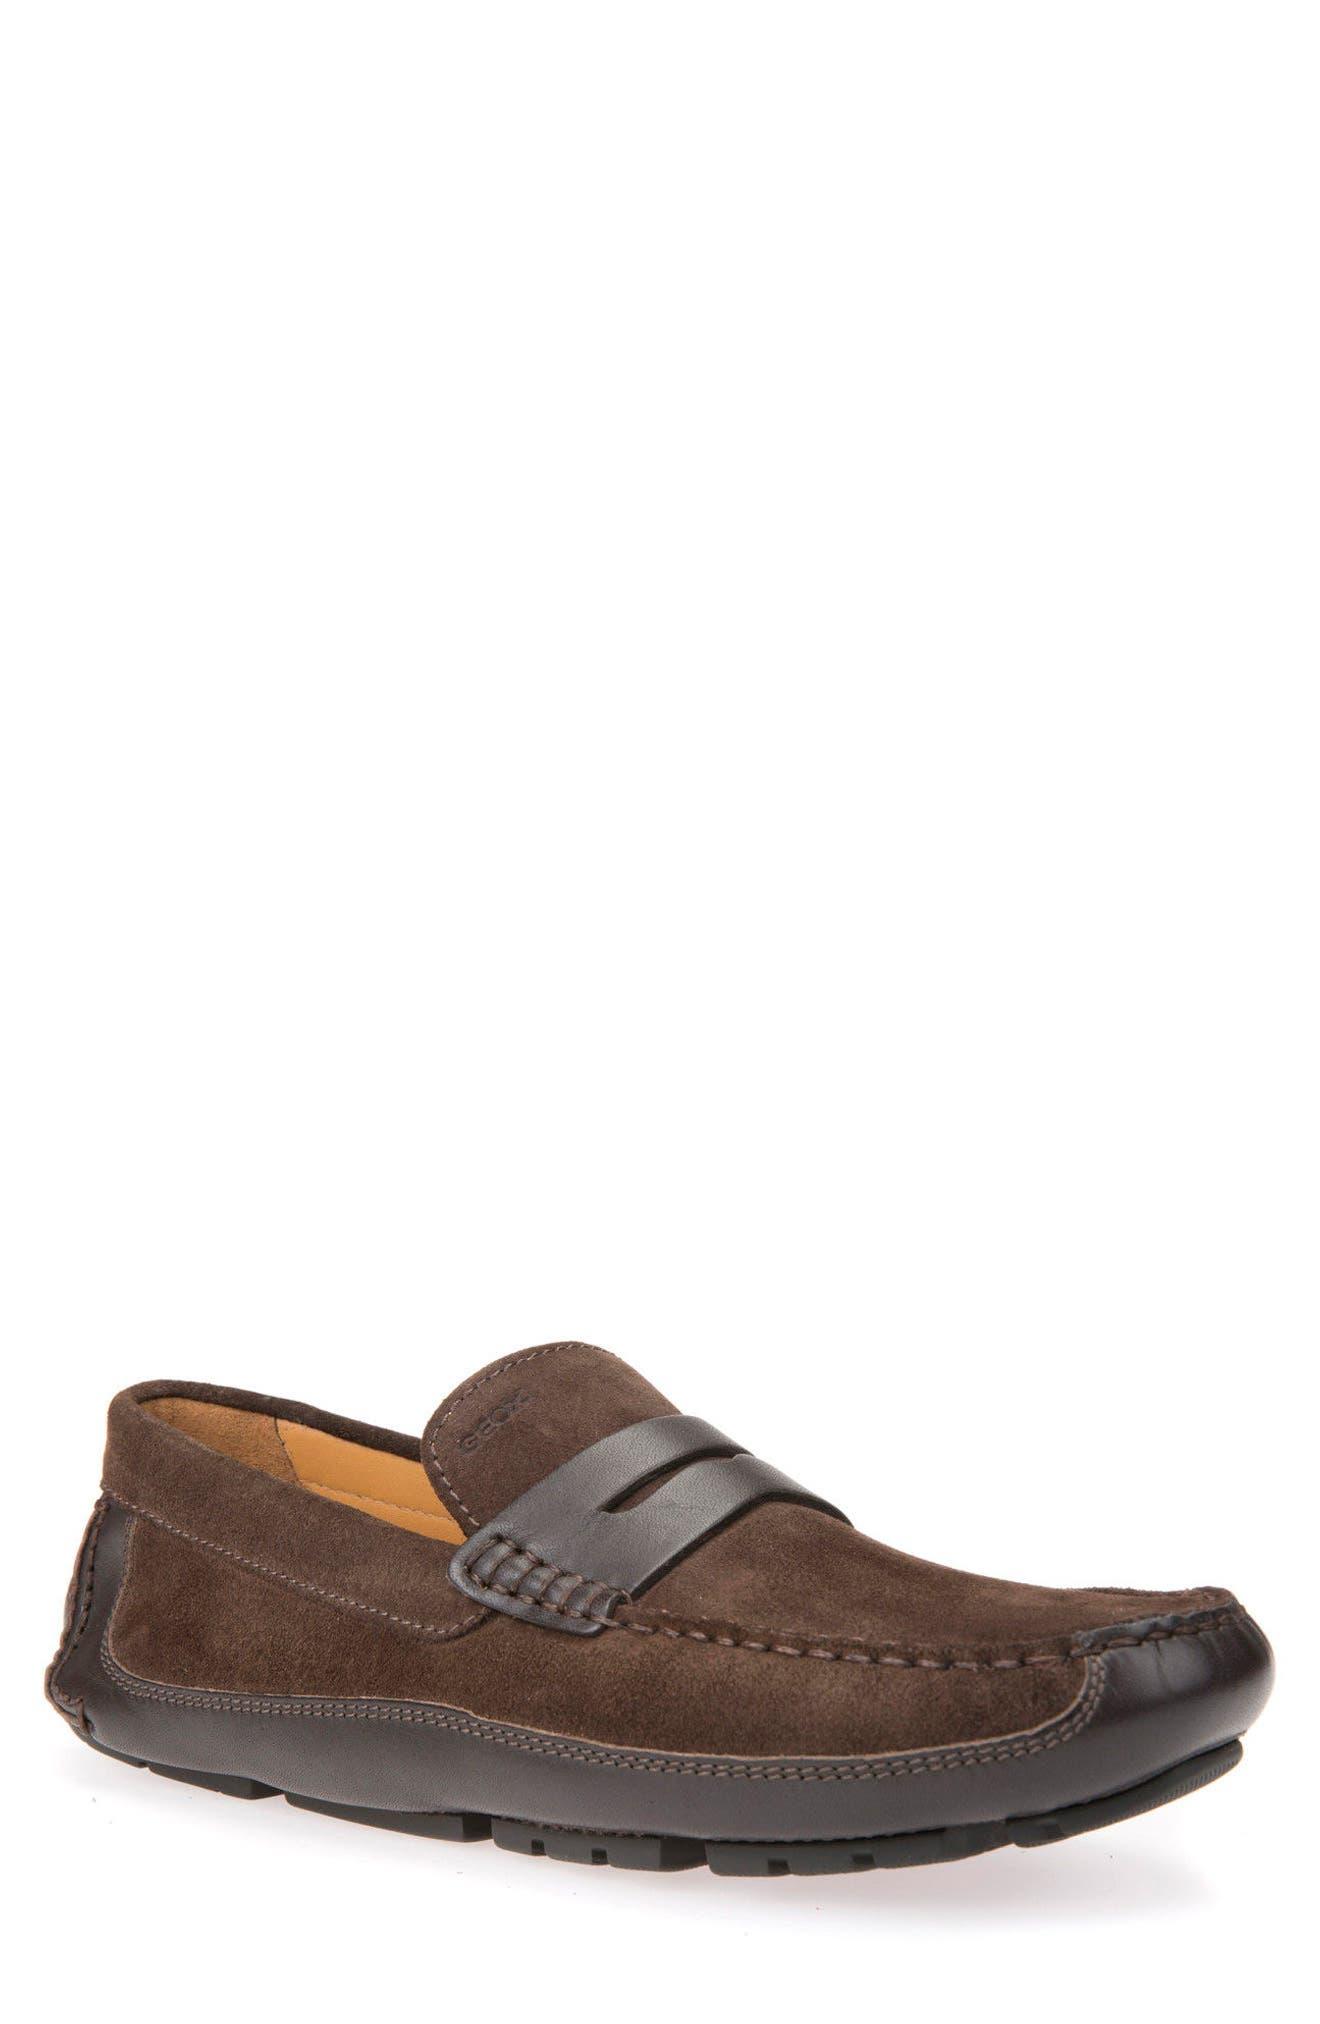 Melbourne 4 Driving Loafer,                         Main,                         color, 204